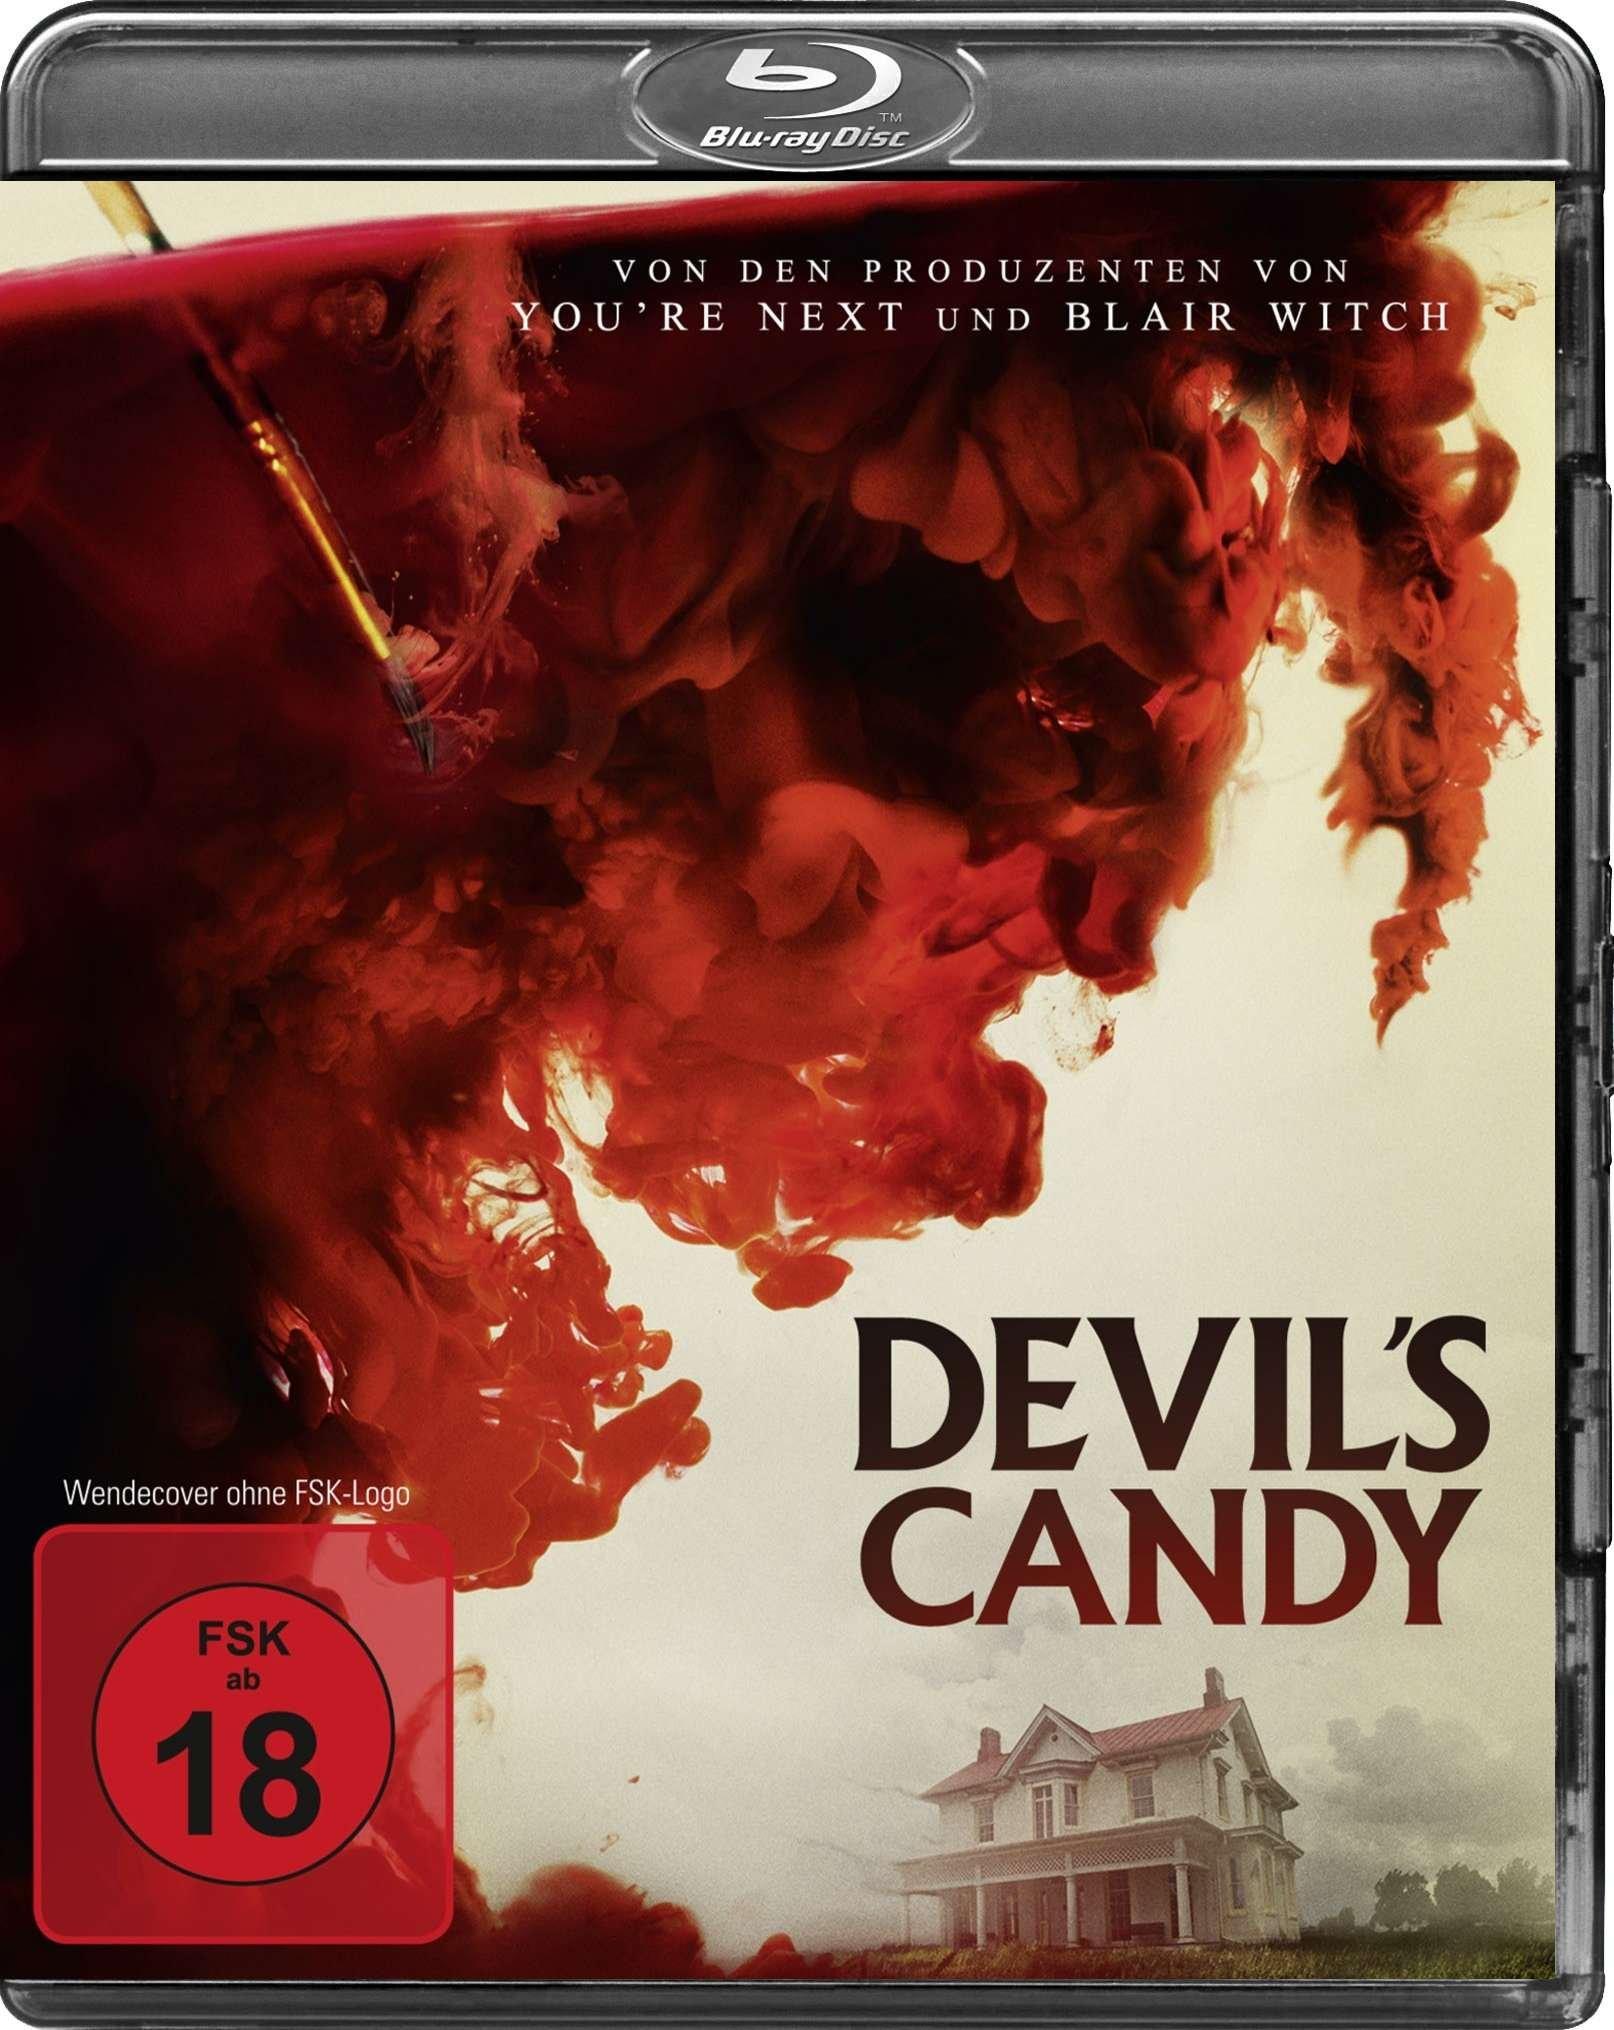 The Devils Candy German 2015 Ac3 BdriP x264-Xf